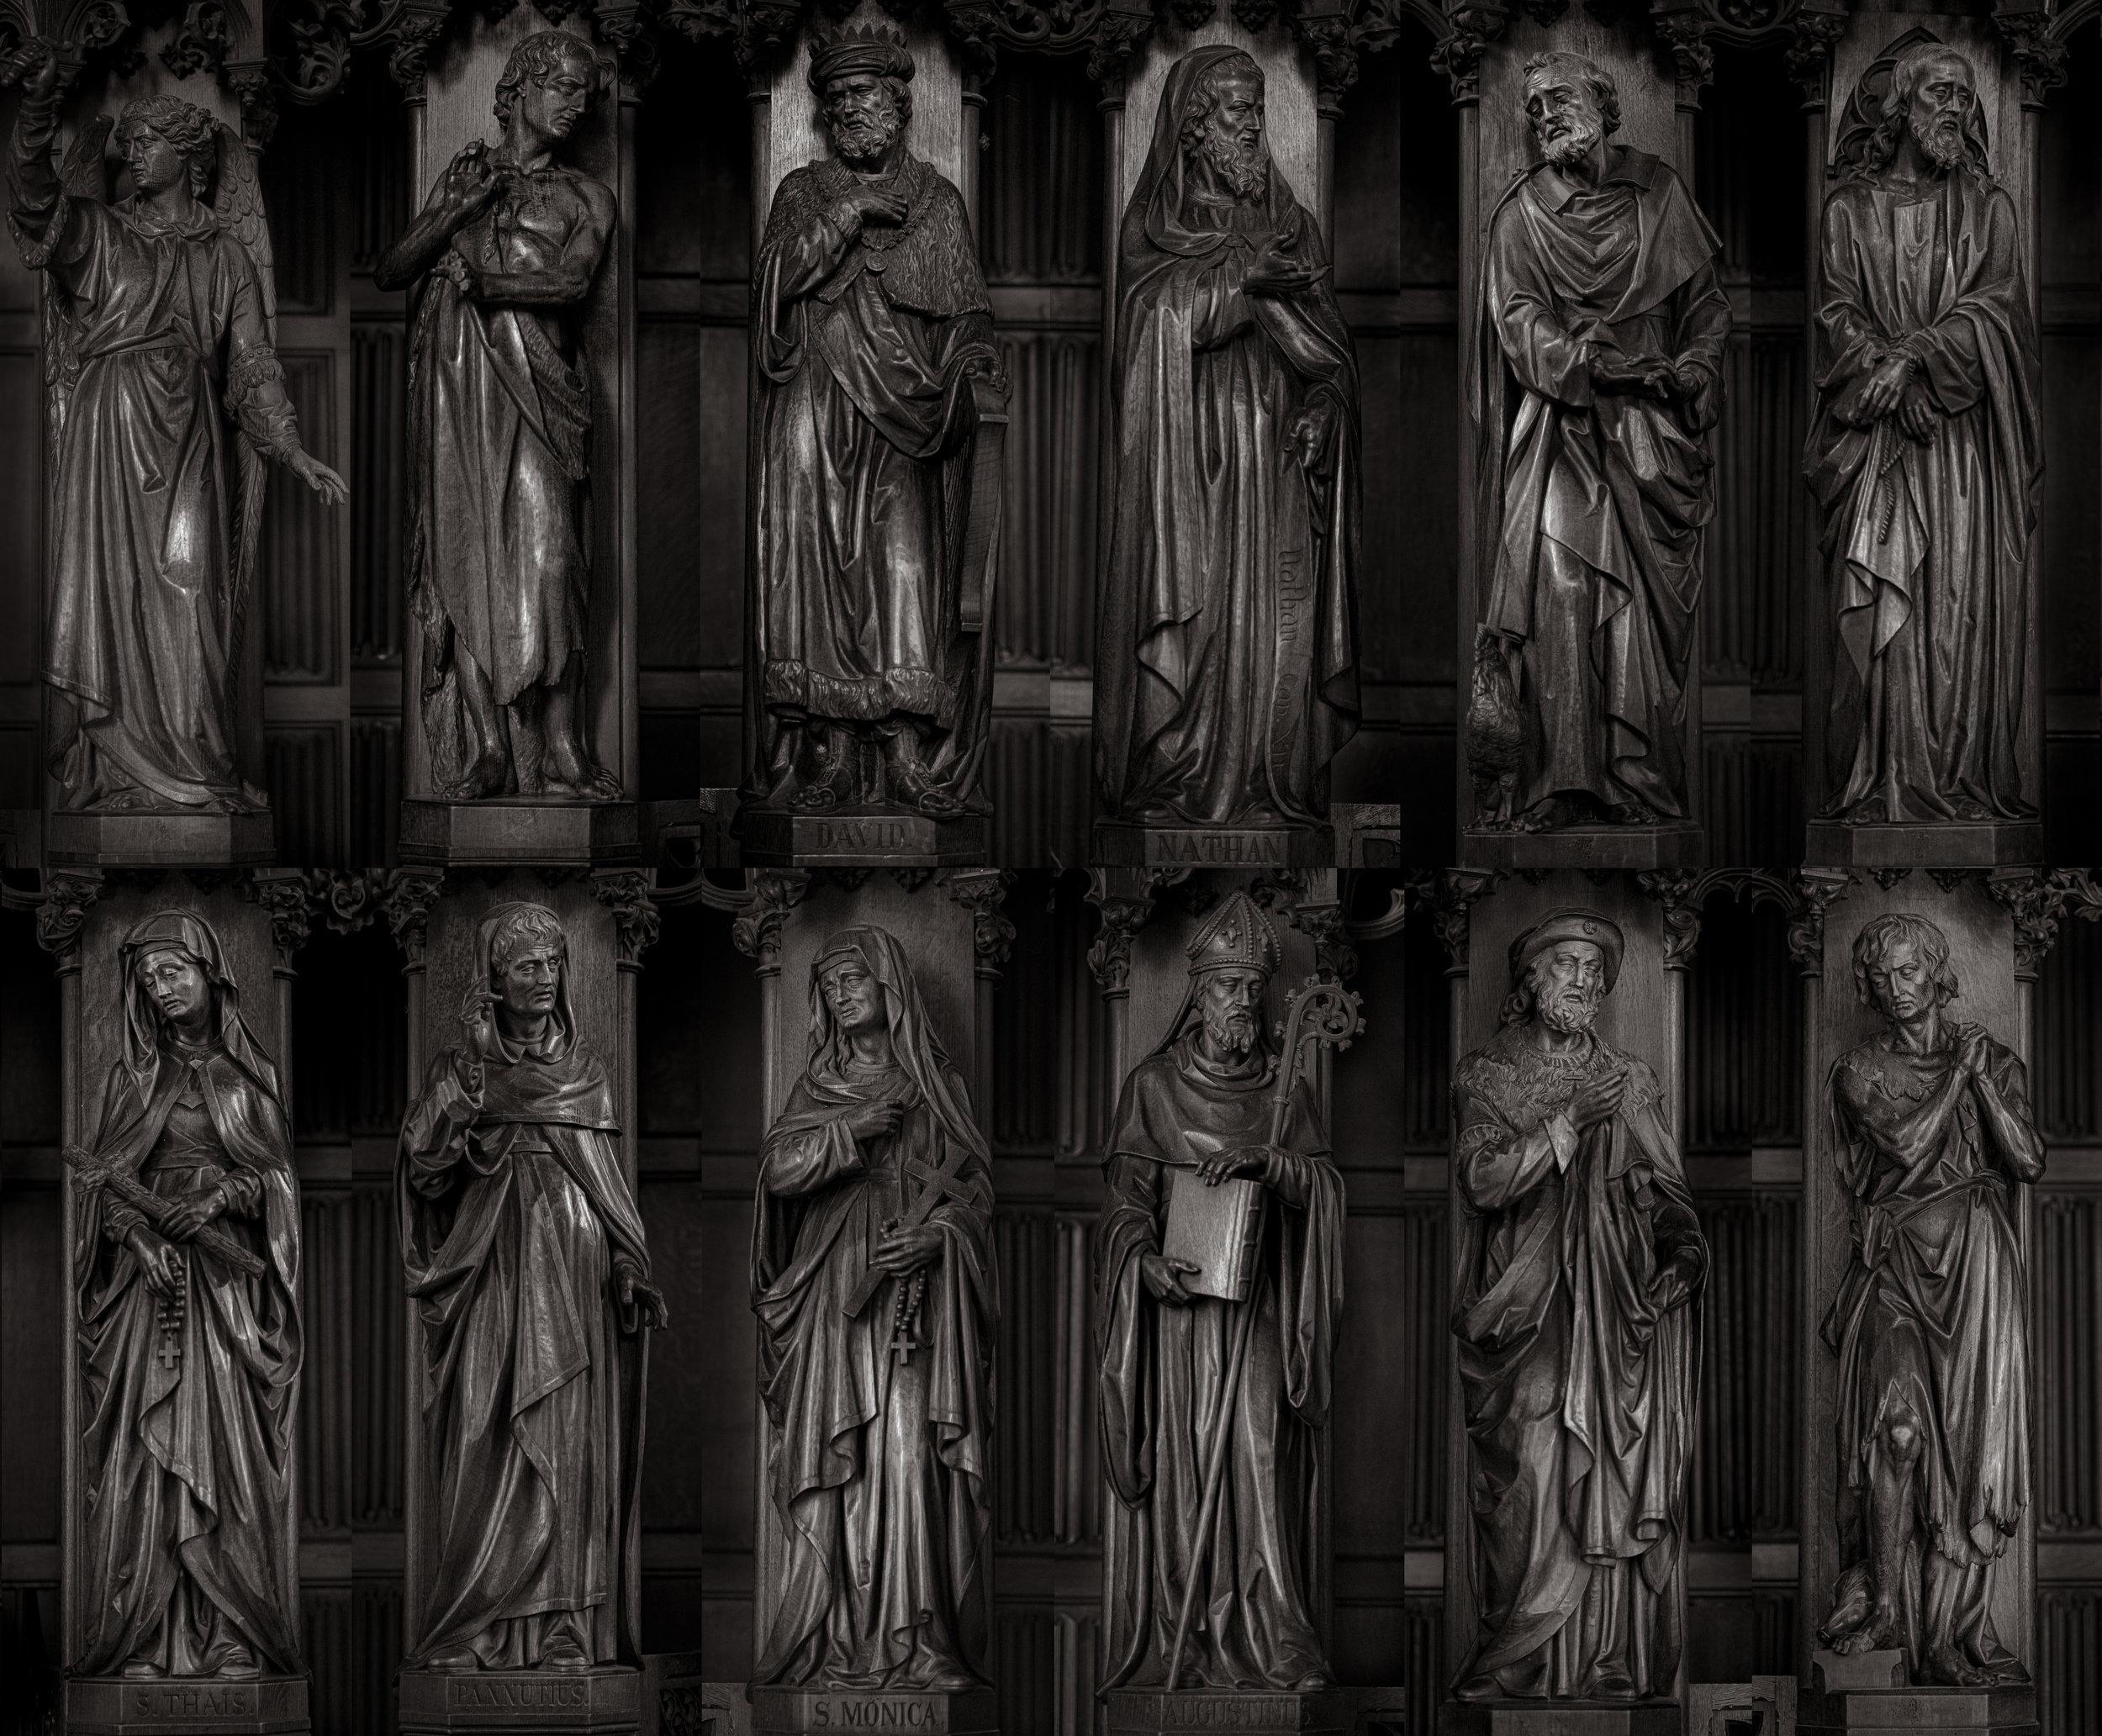 Saints-2.jpg